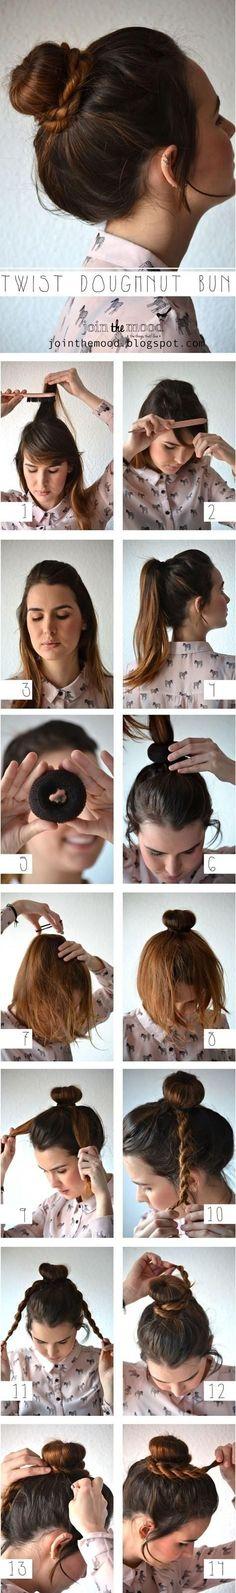 #DIY Twist Doughnut Bun Hairstyle